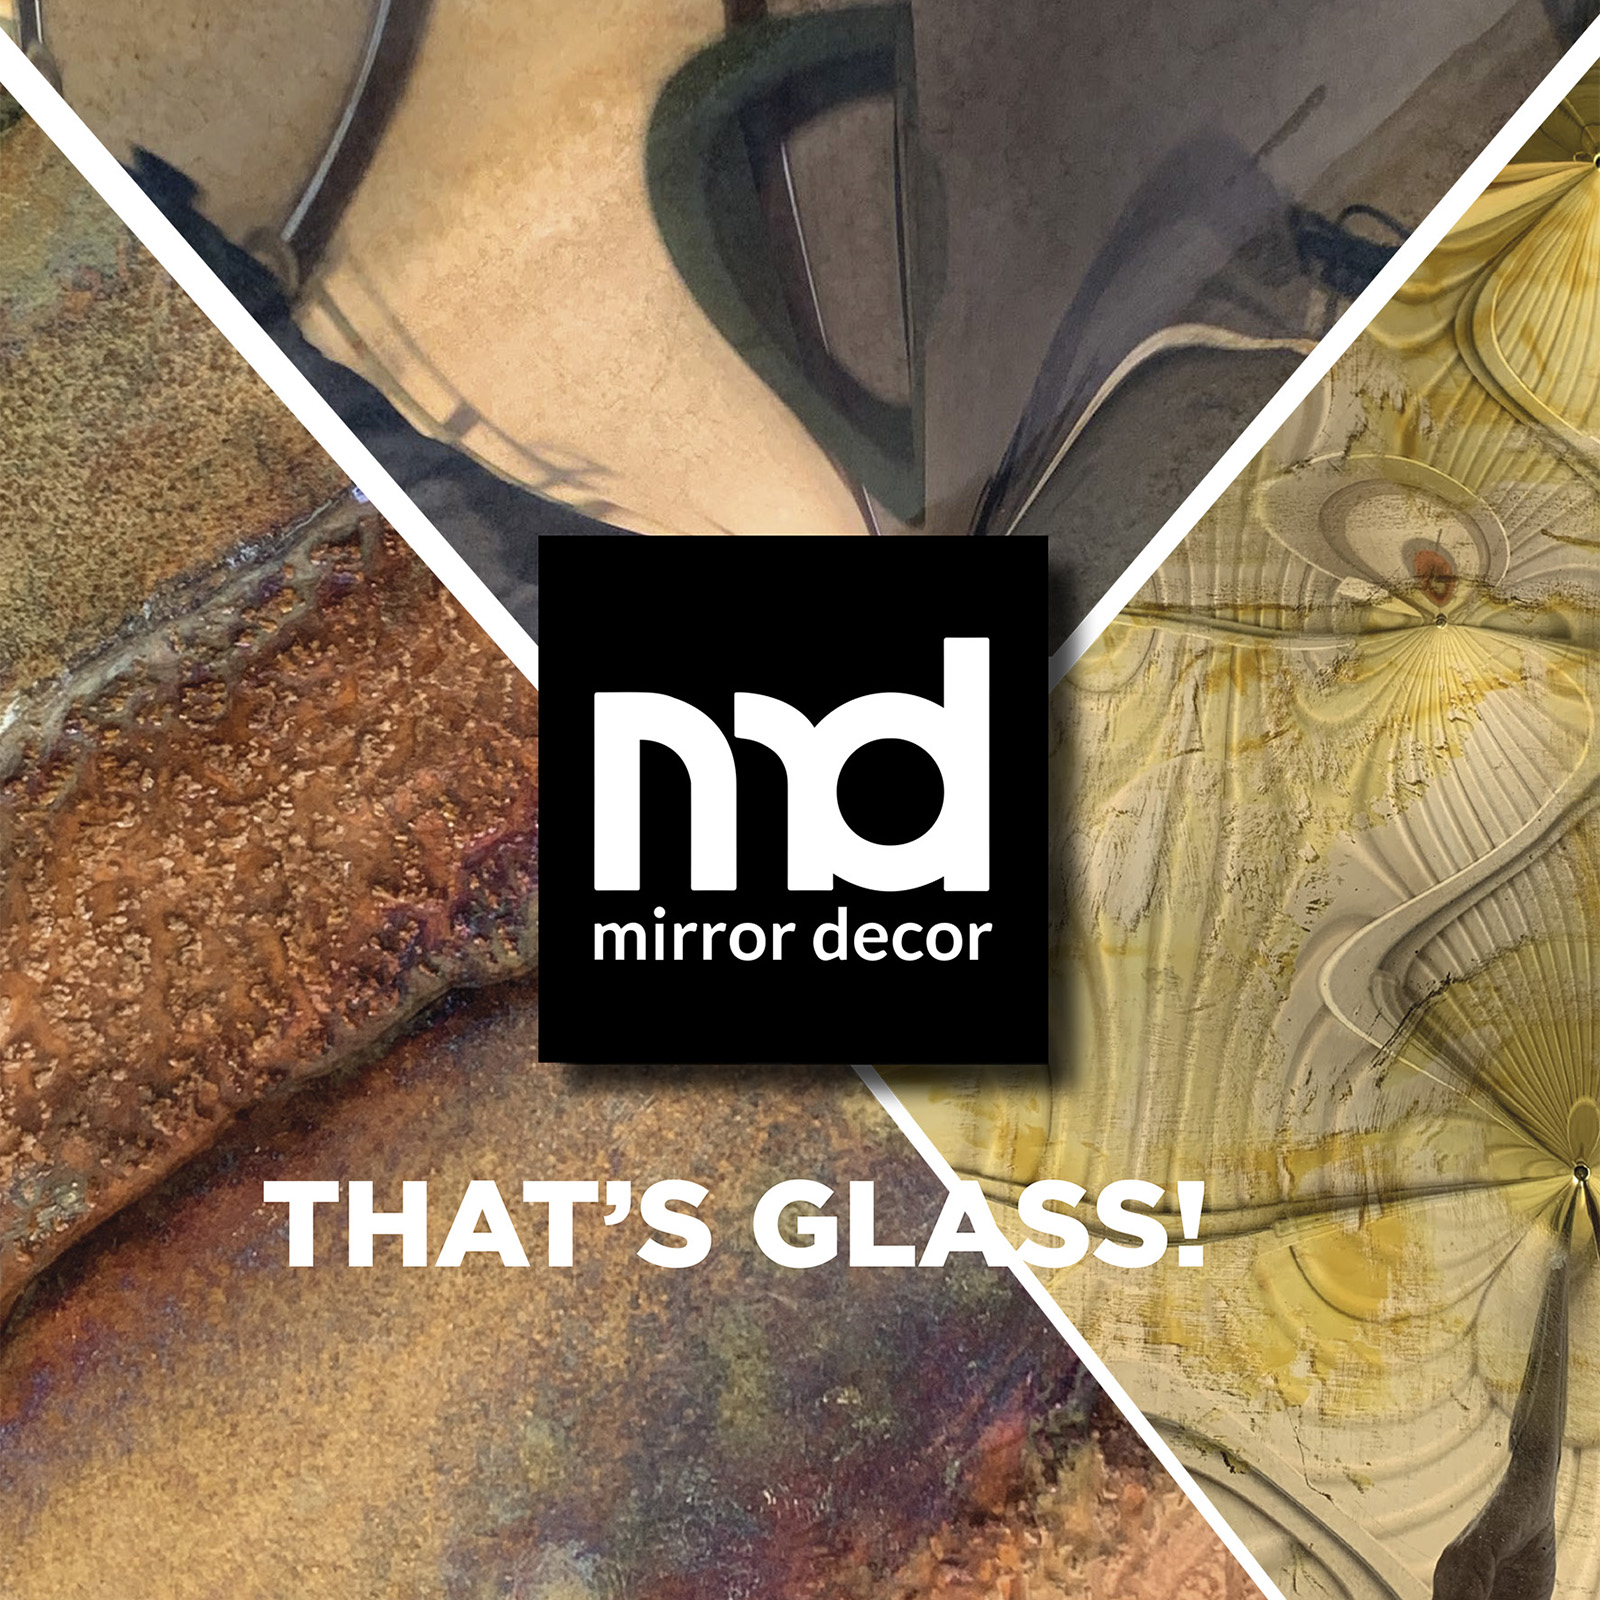 Mirror Decor depliant